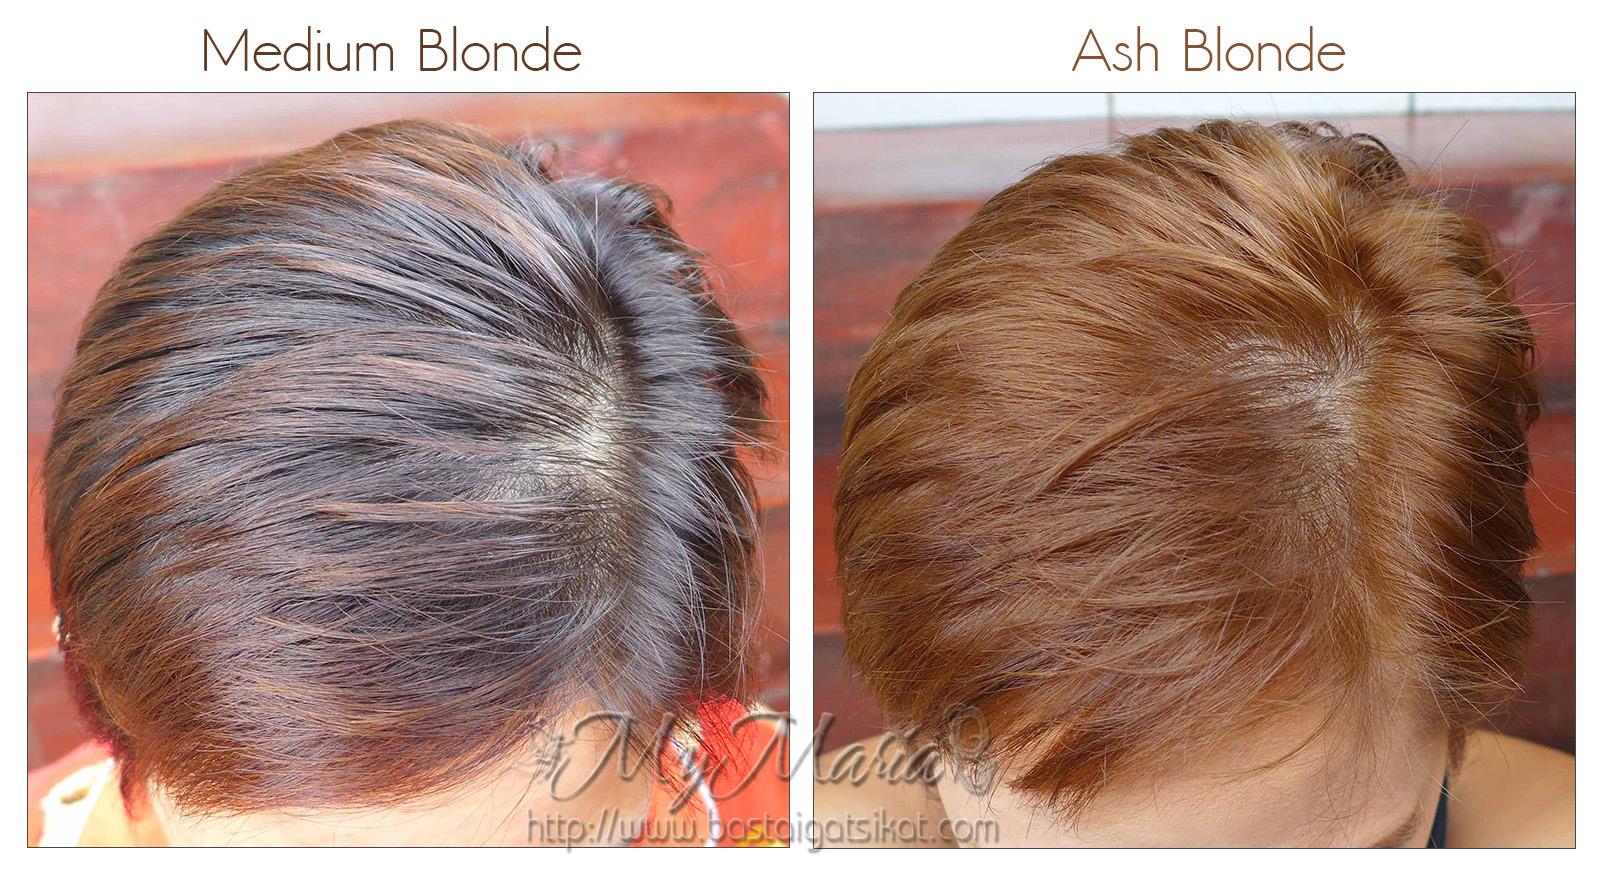 Hair color chart hortaleza hortaleza professional hair coloring hair color chart hortaleza hbc hortaleza ash blonde v 2 basta igat sikat by mymaria nvjuhfo Gallery